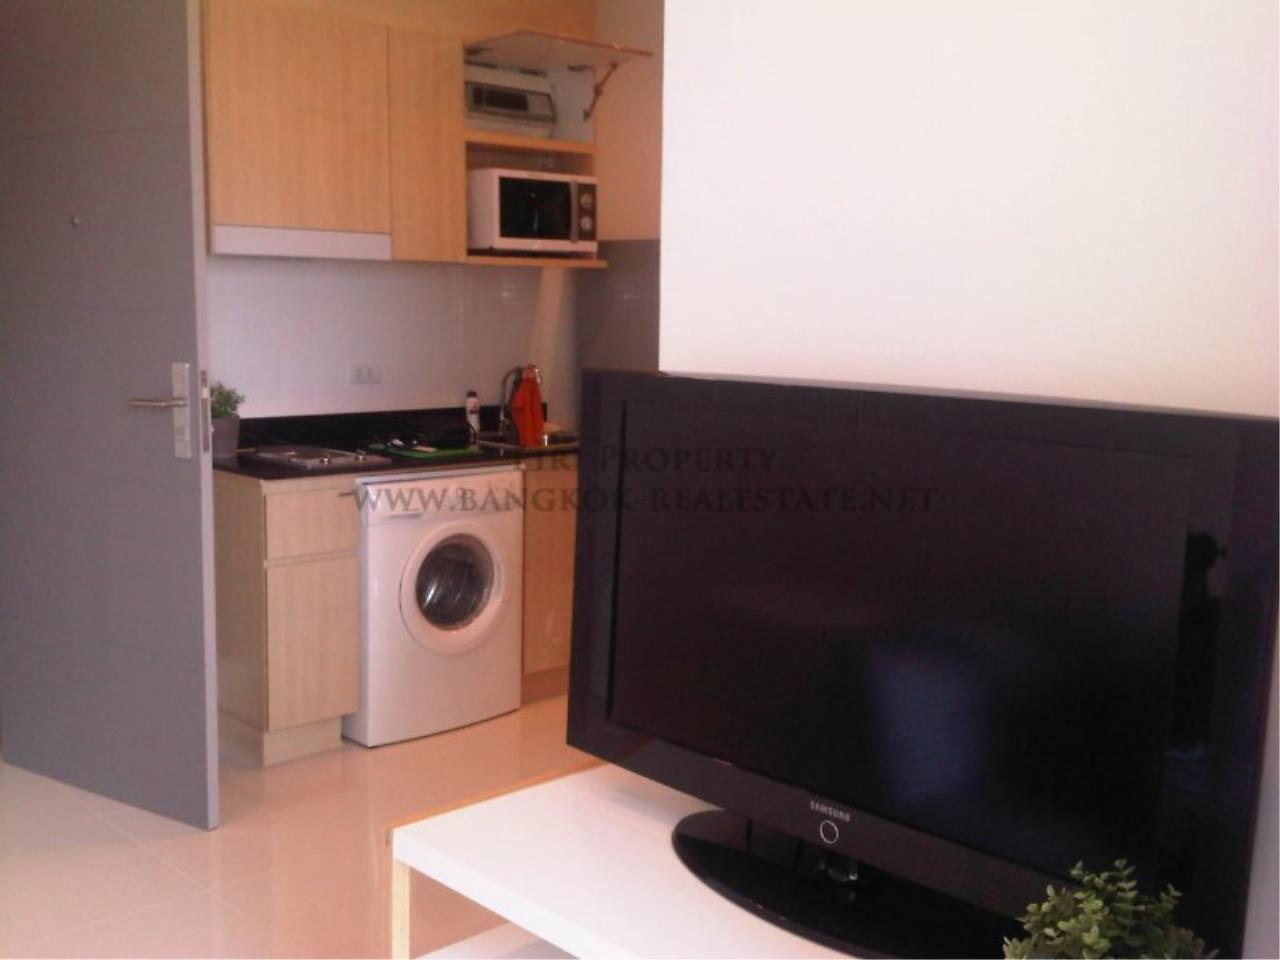 Piri Property Agency's 2 Bedroom - Modern and Brand New - IDEO Verve 2